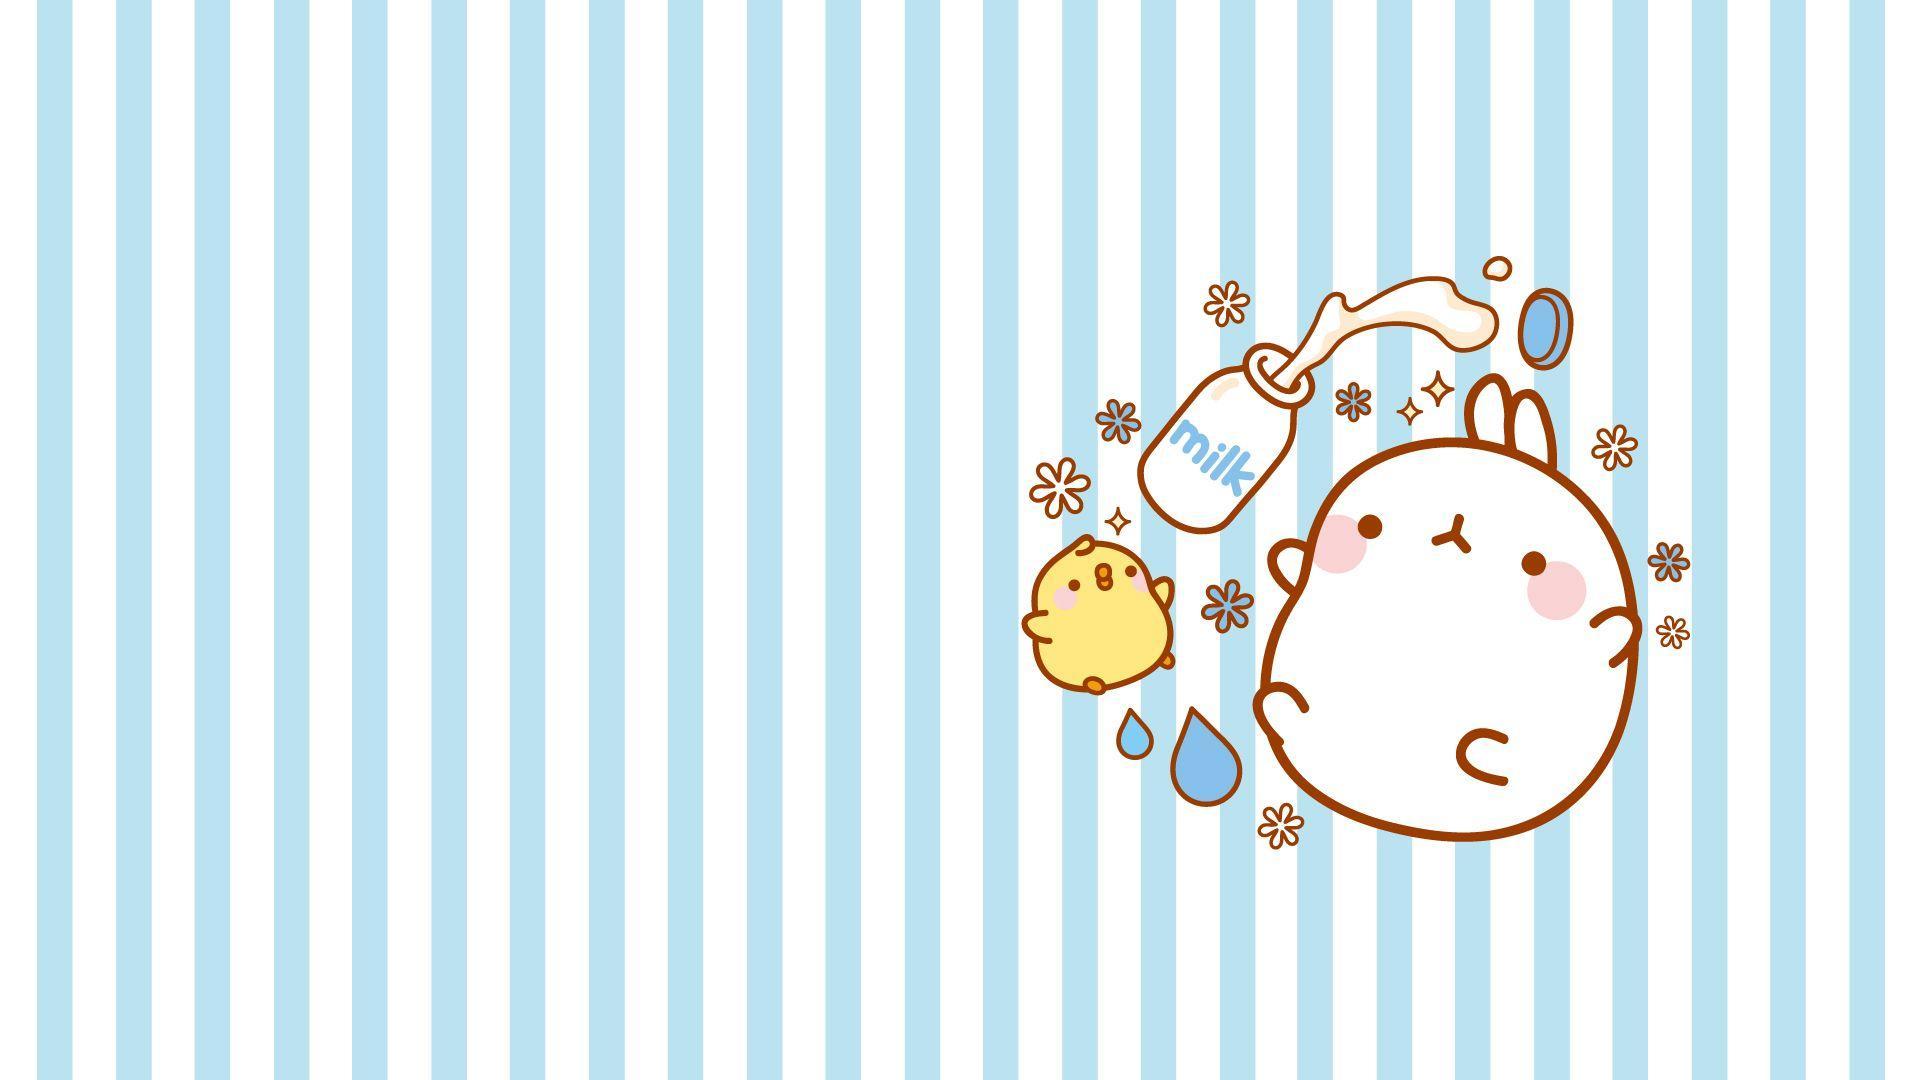 Kawaii Bunny Wallpapers - Top Free Kawaii Bunny ...